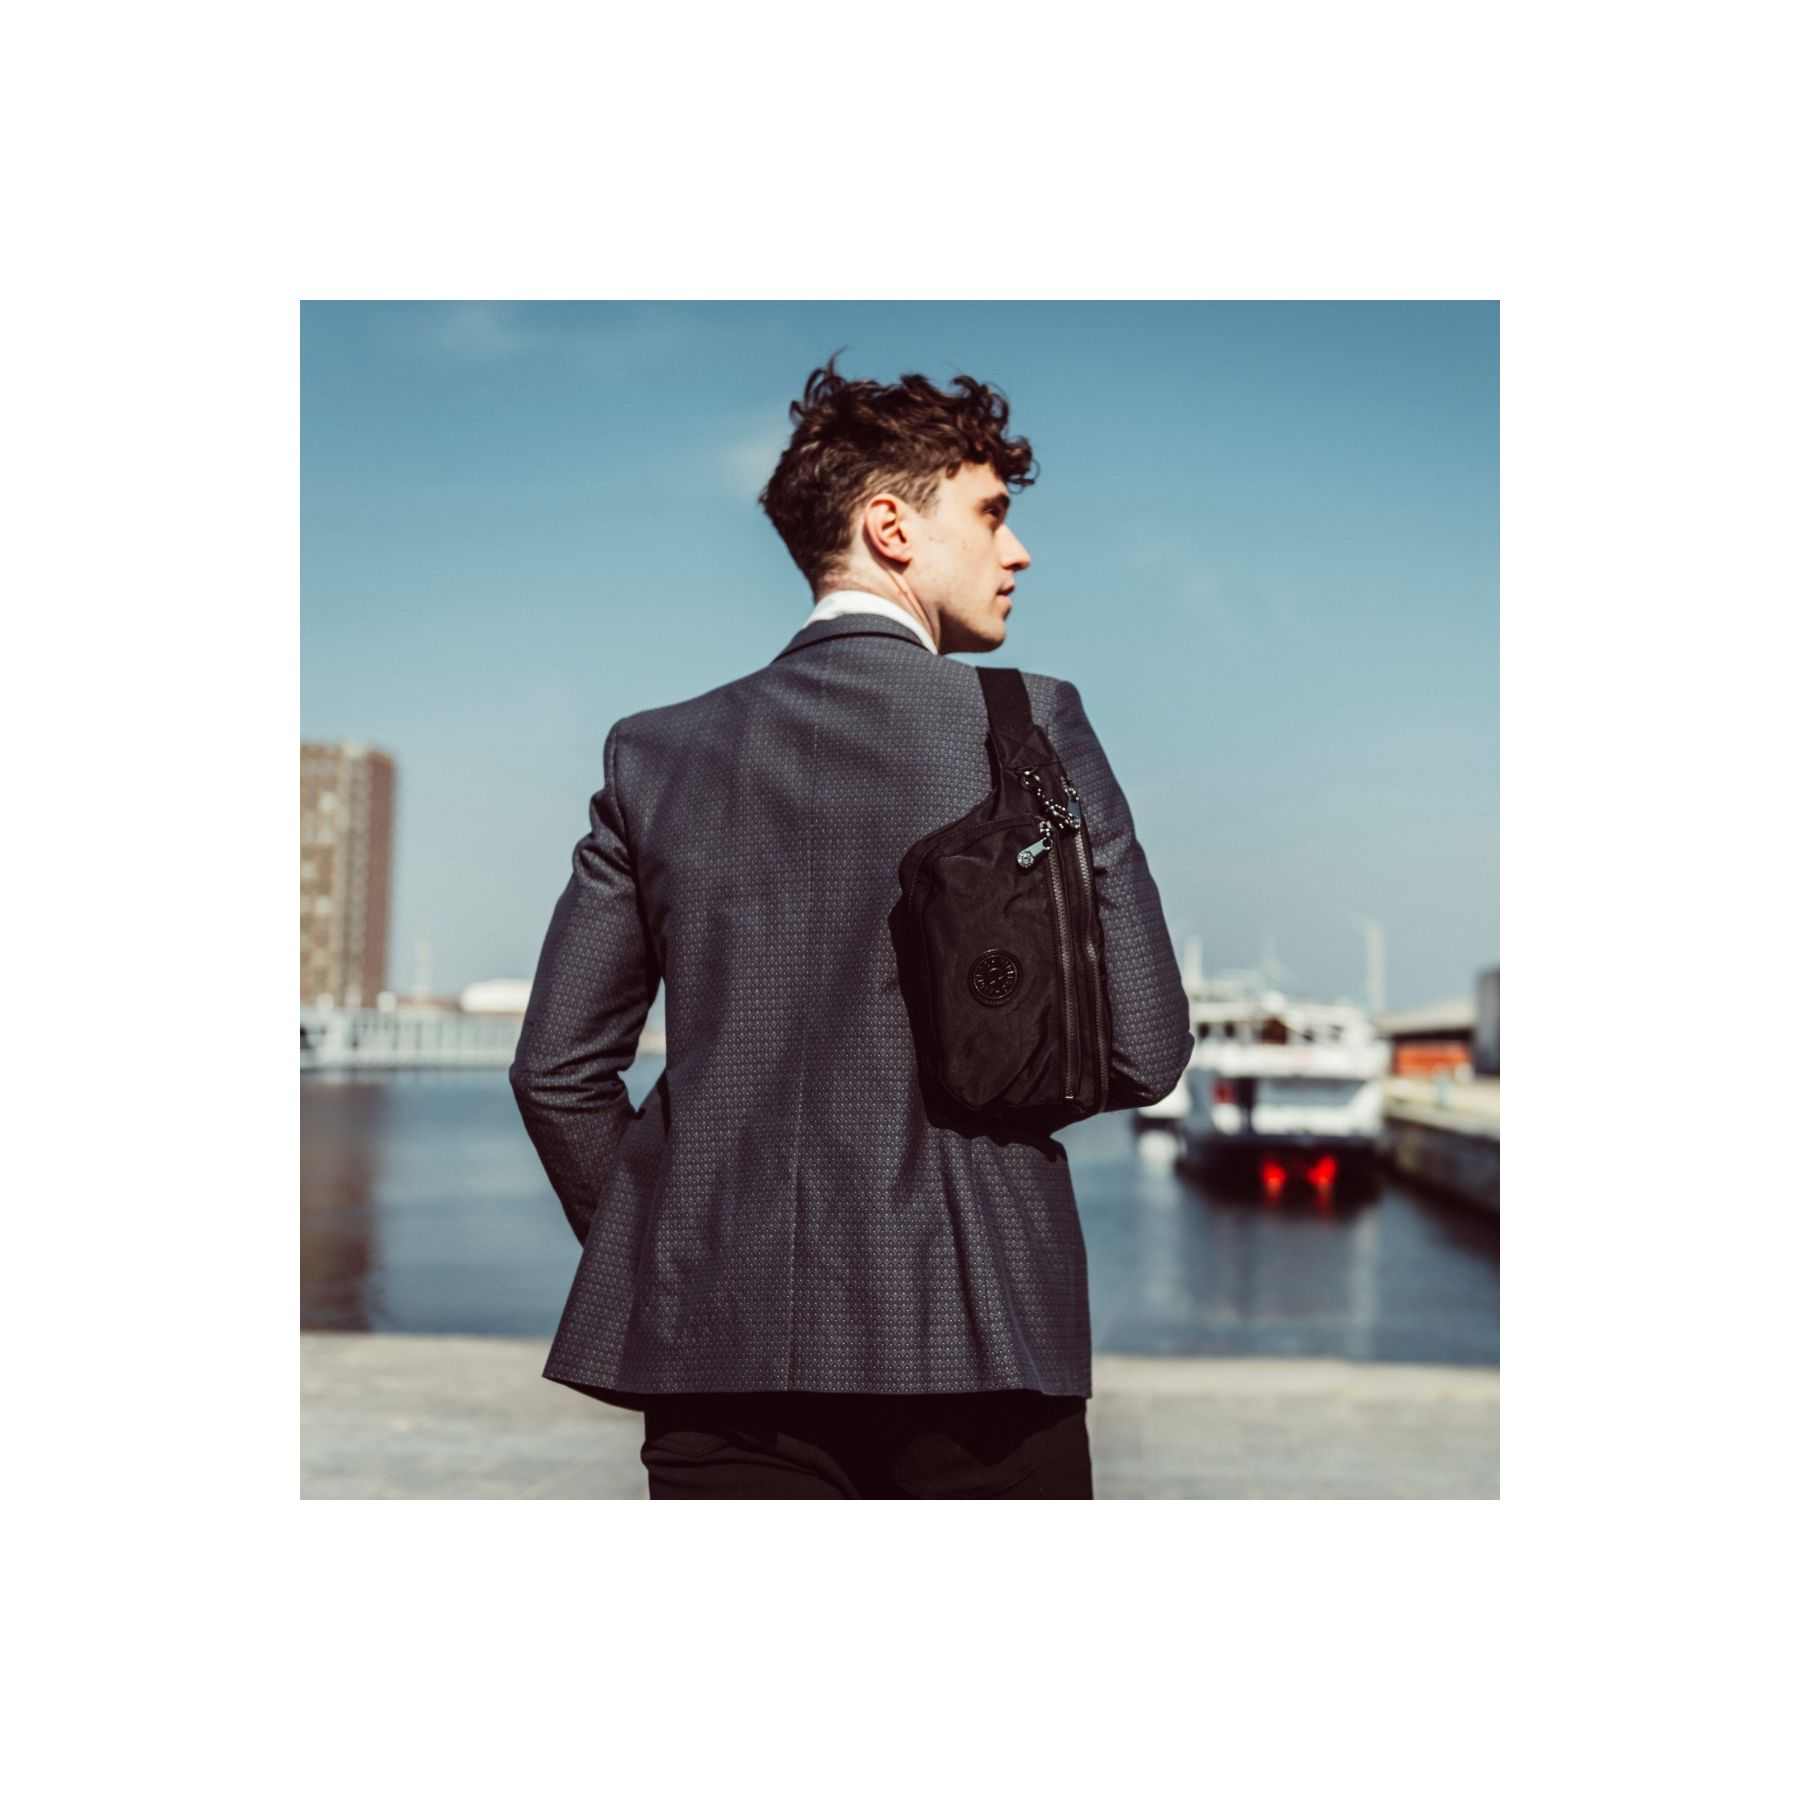 YASEMINA XL Latest Shoulder Bags by Kipling